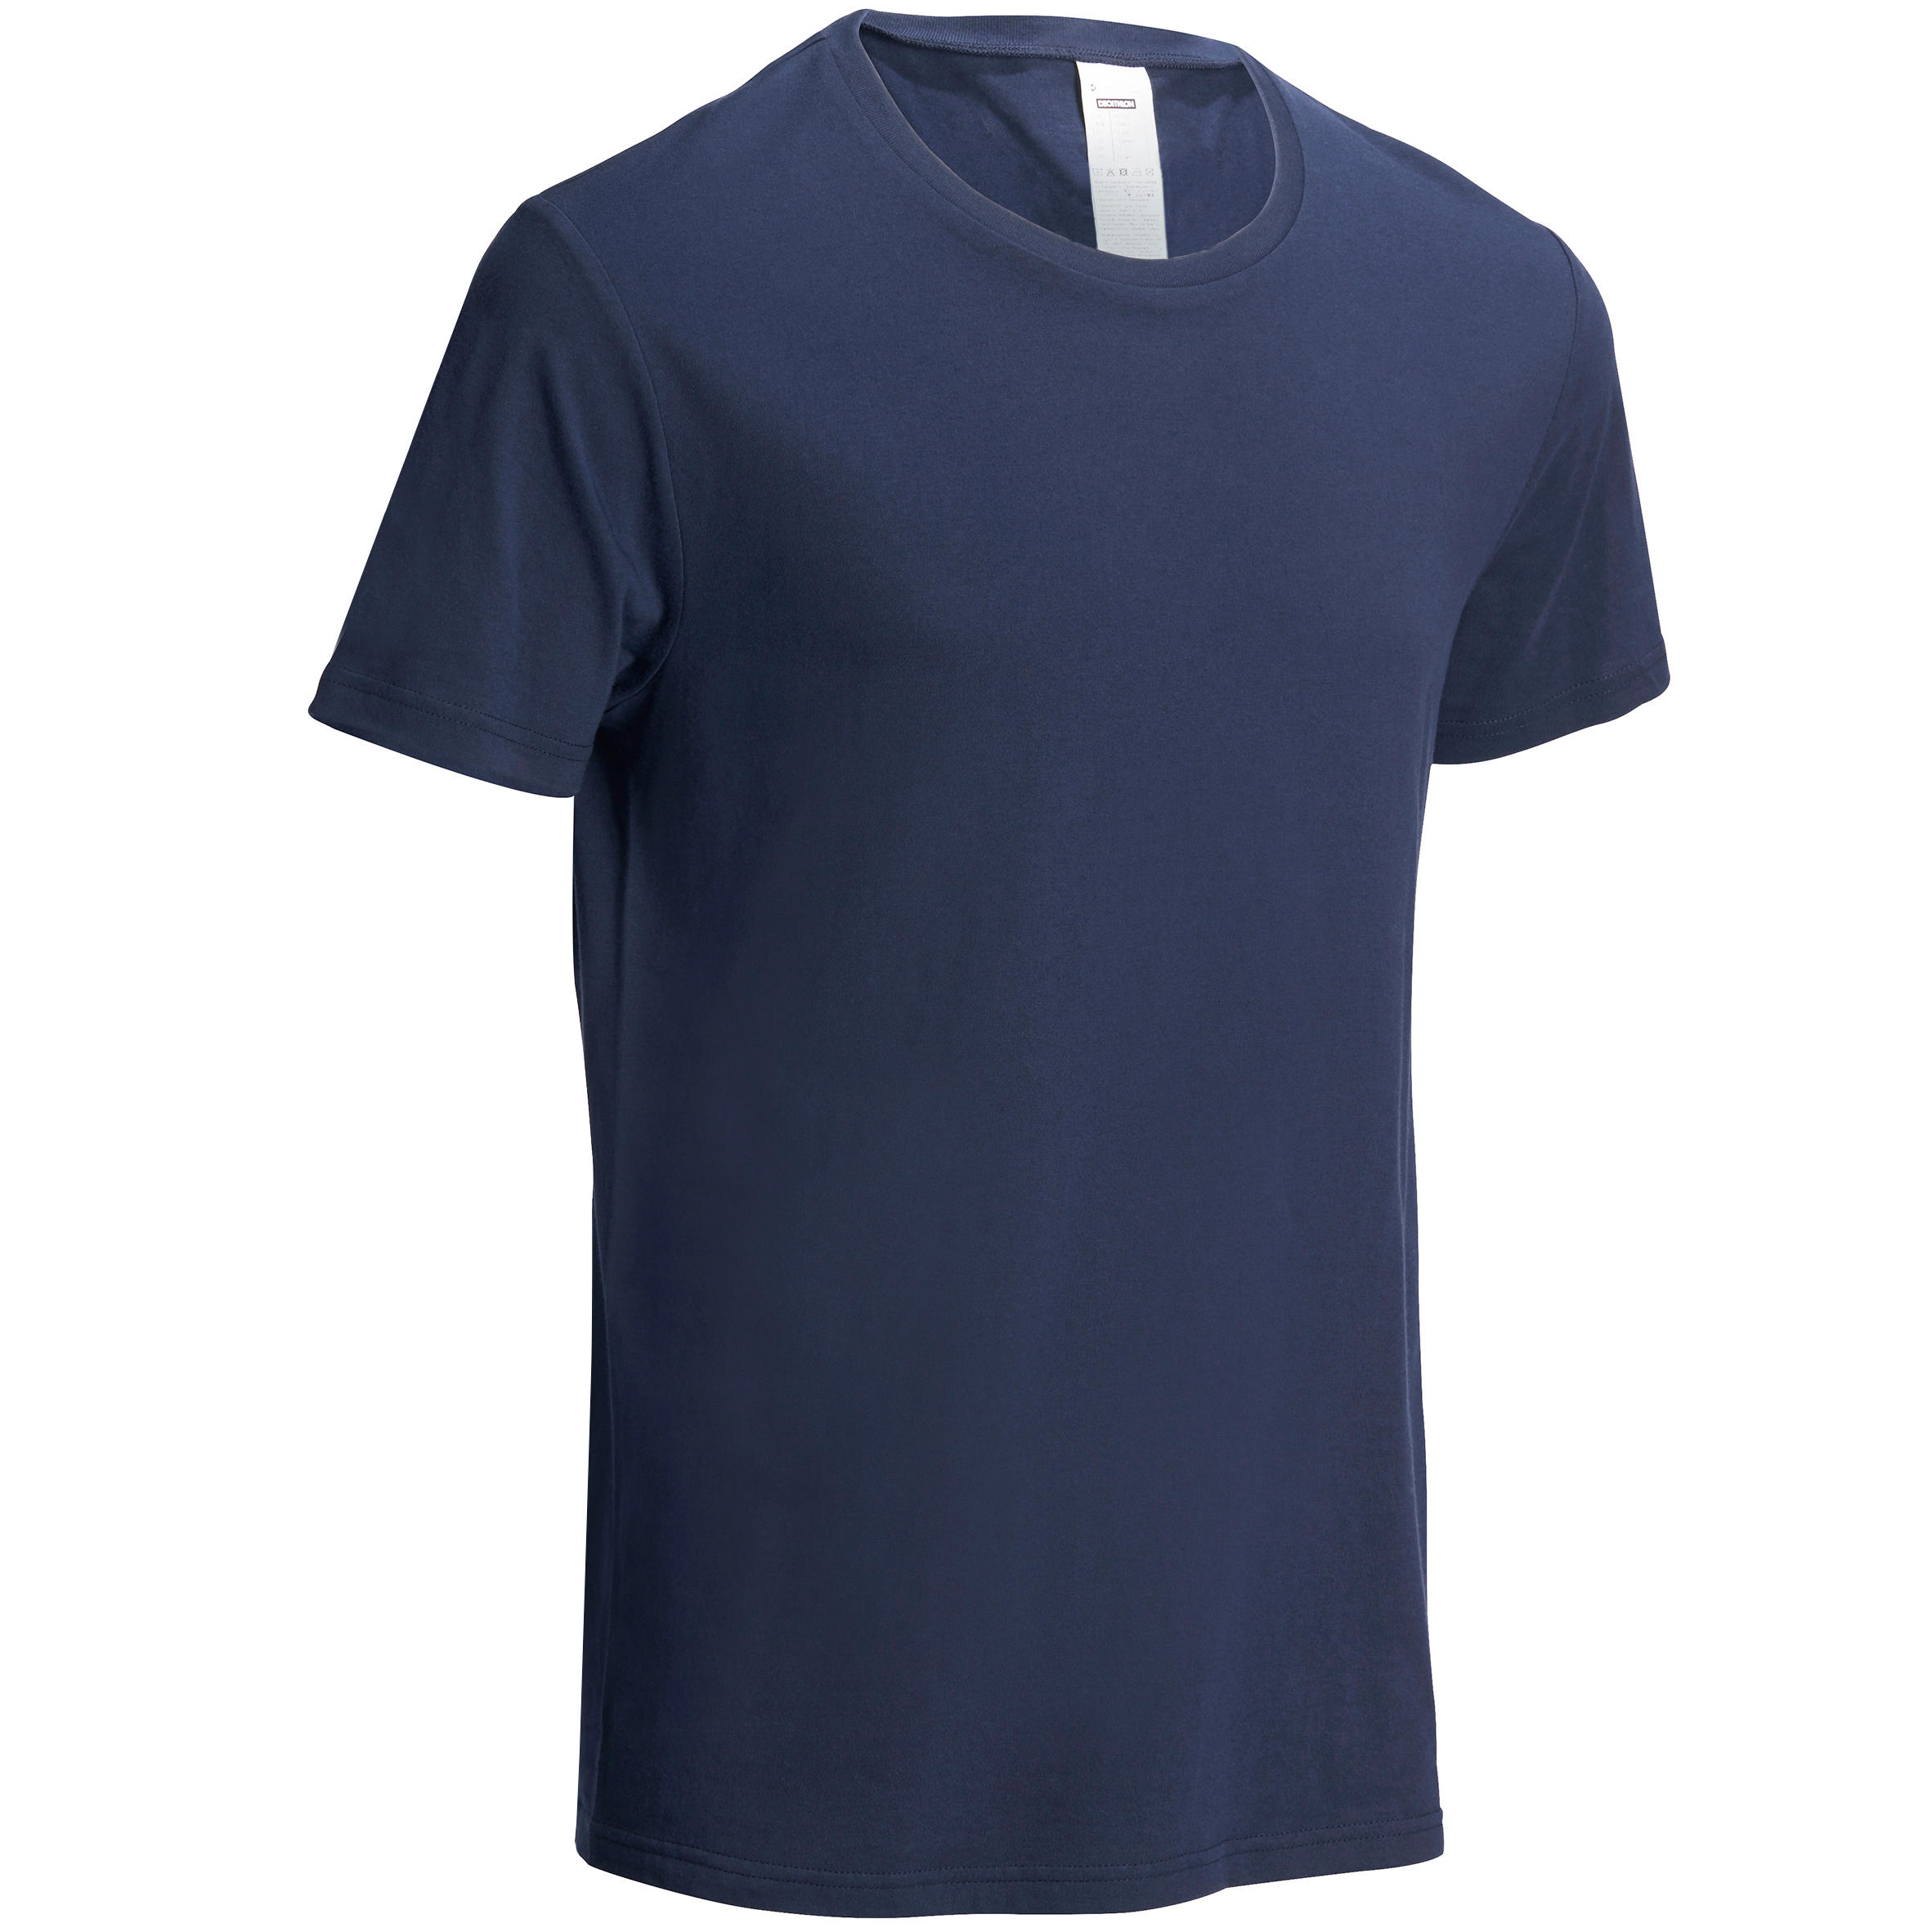 Camiseta de gimnasia y pilates para hombre azul marino Sportee